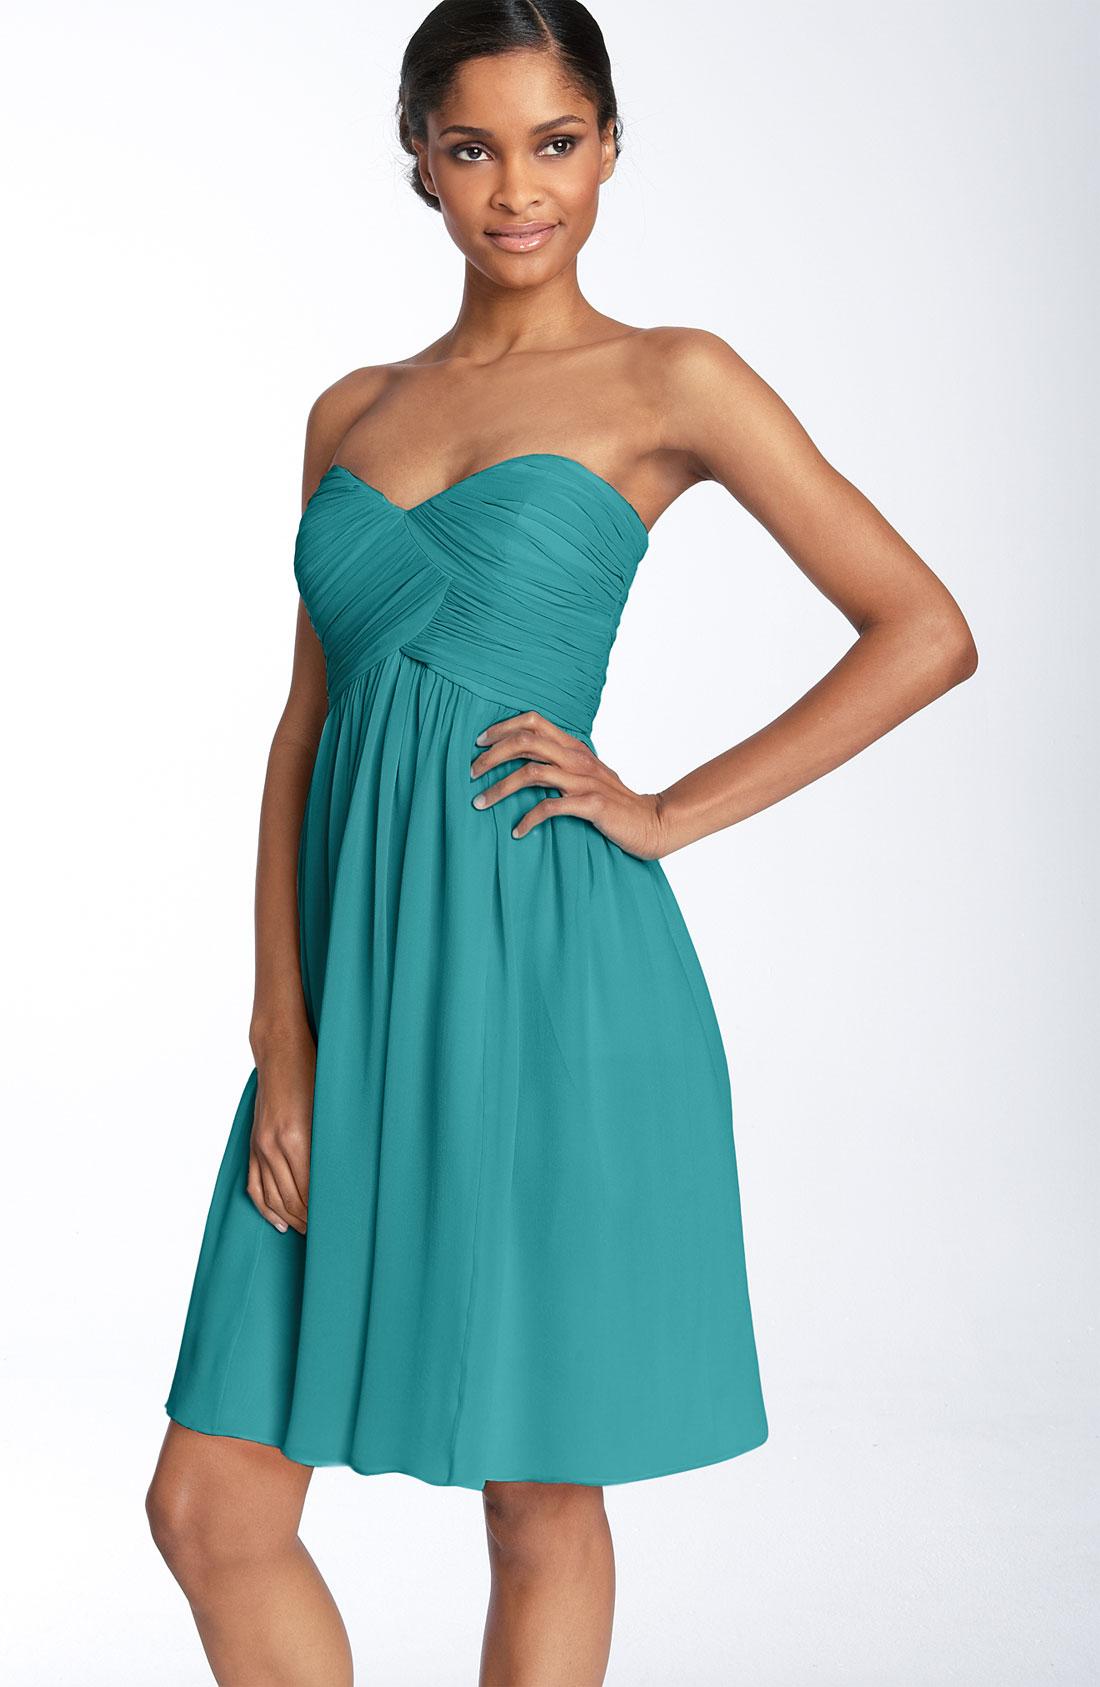 Donna morgan 'Morgan' Strapless Silk Chiffon Dress in Blue | Lyst